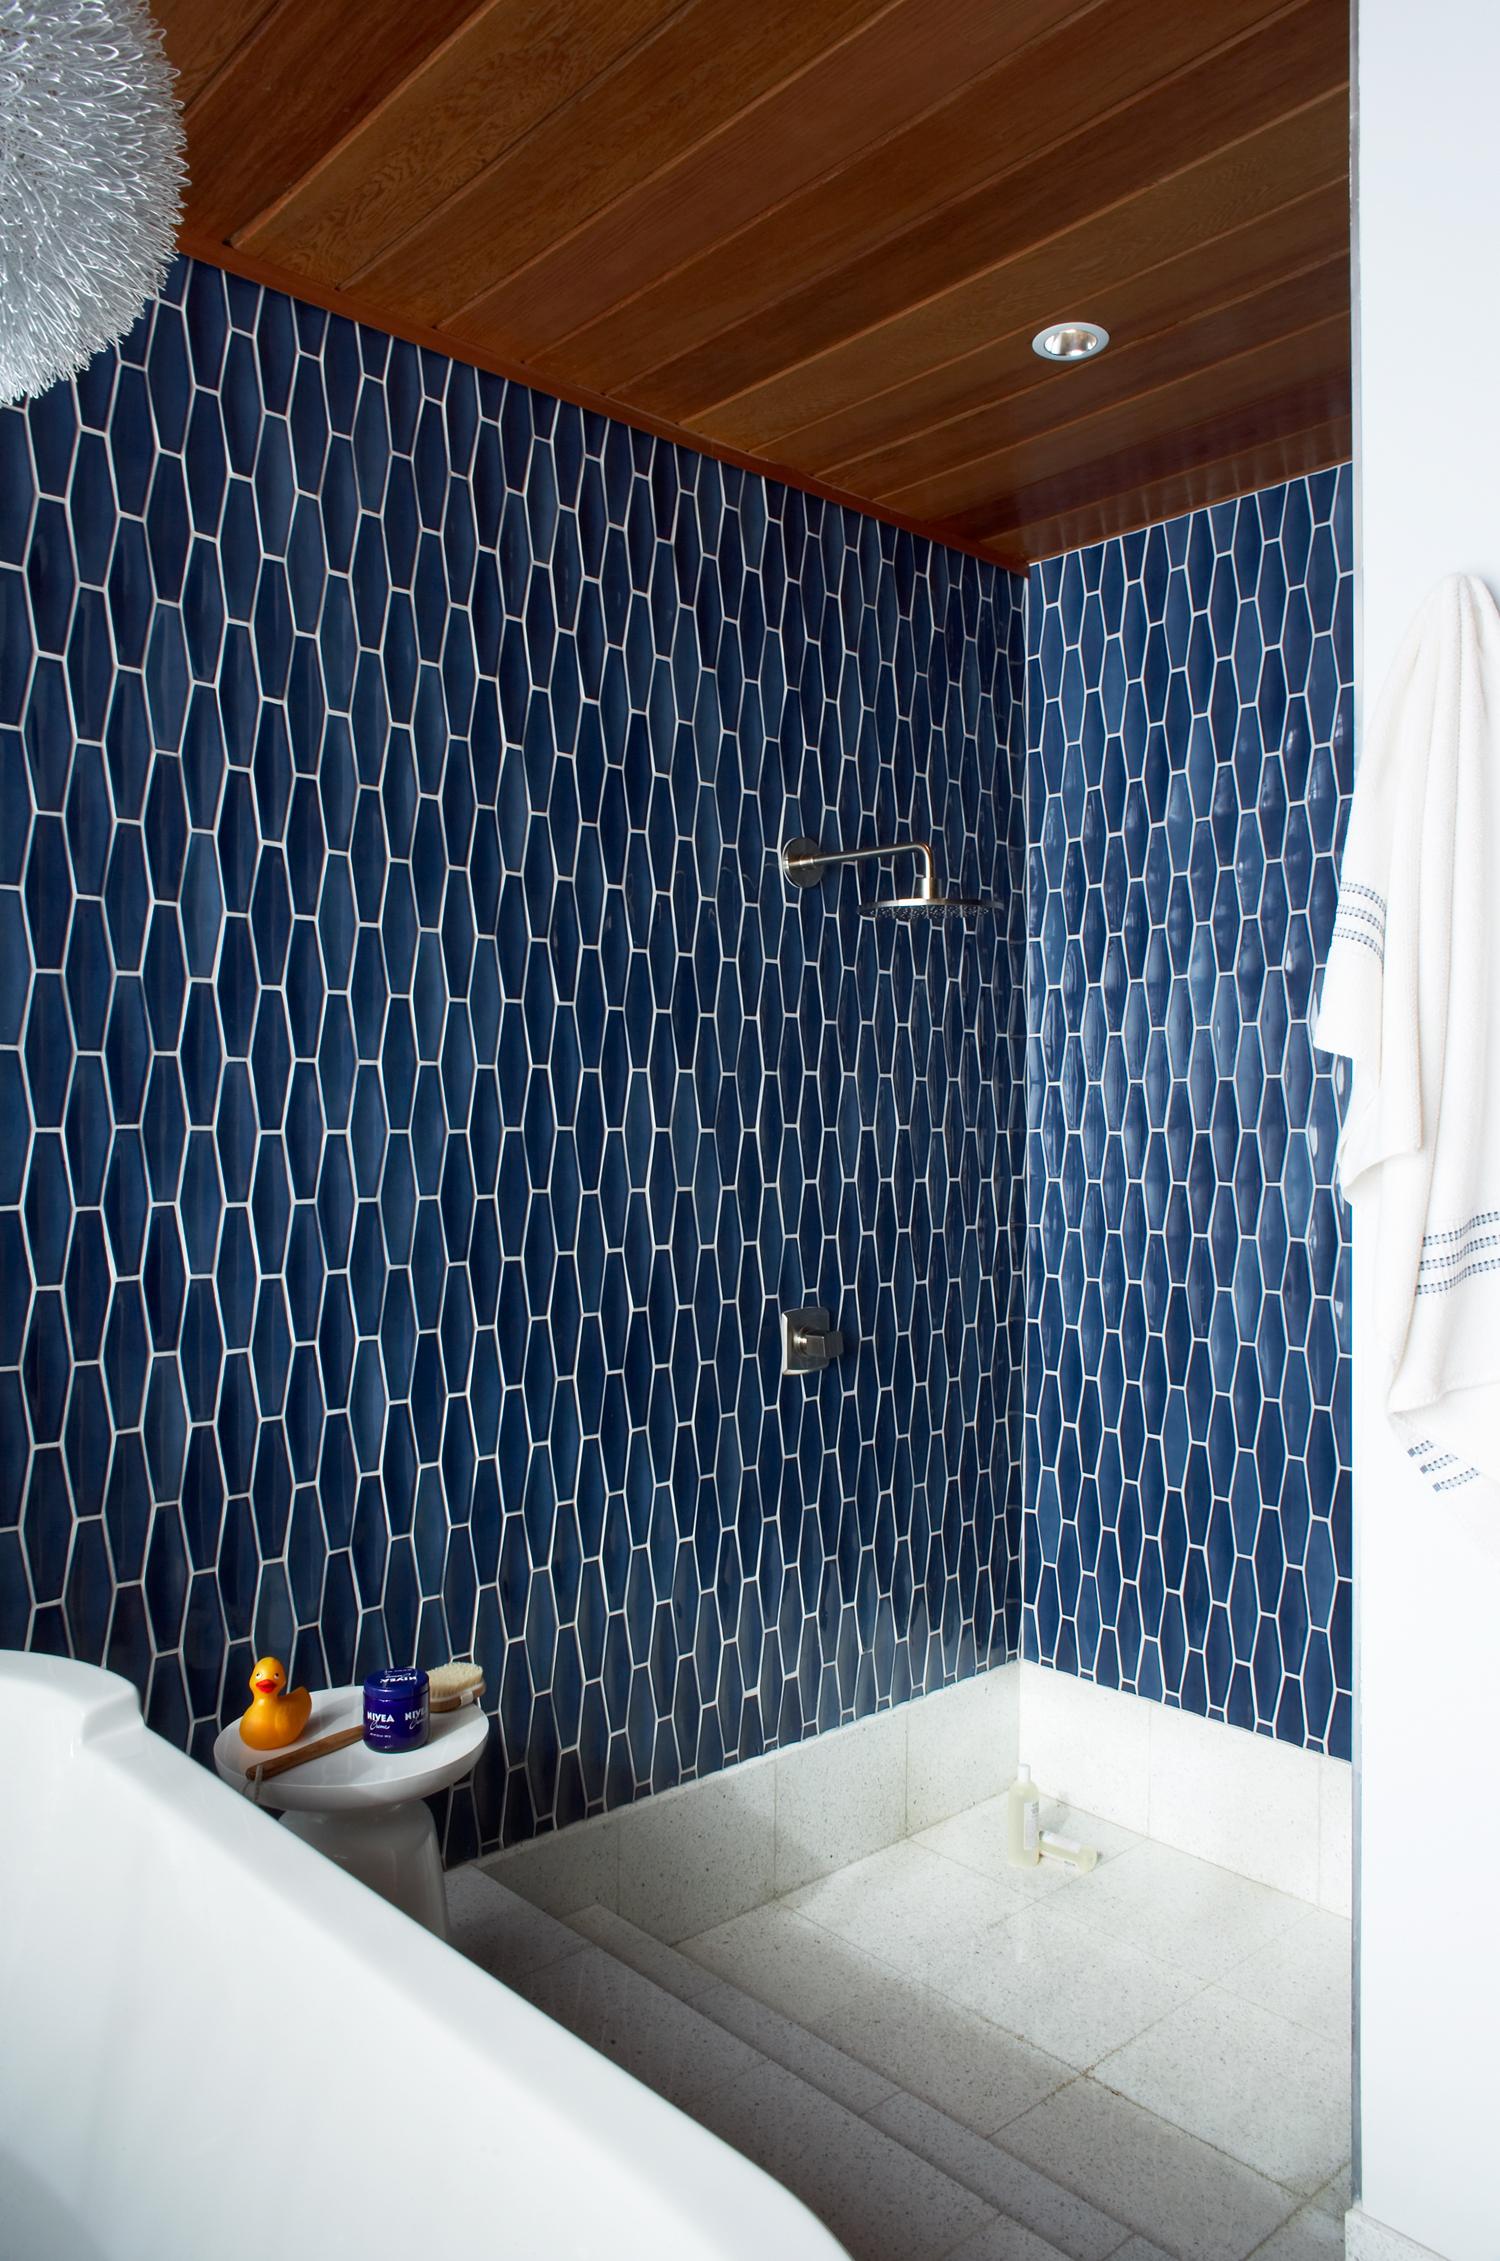 Fresh New Looks for a Bathroom - Sunset Magazine